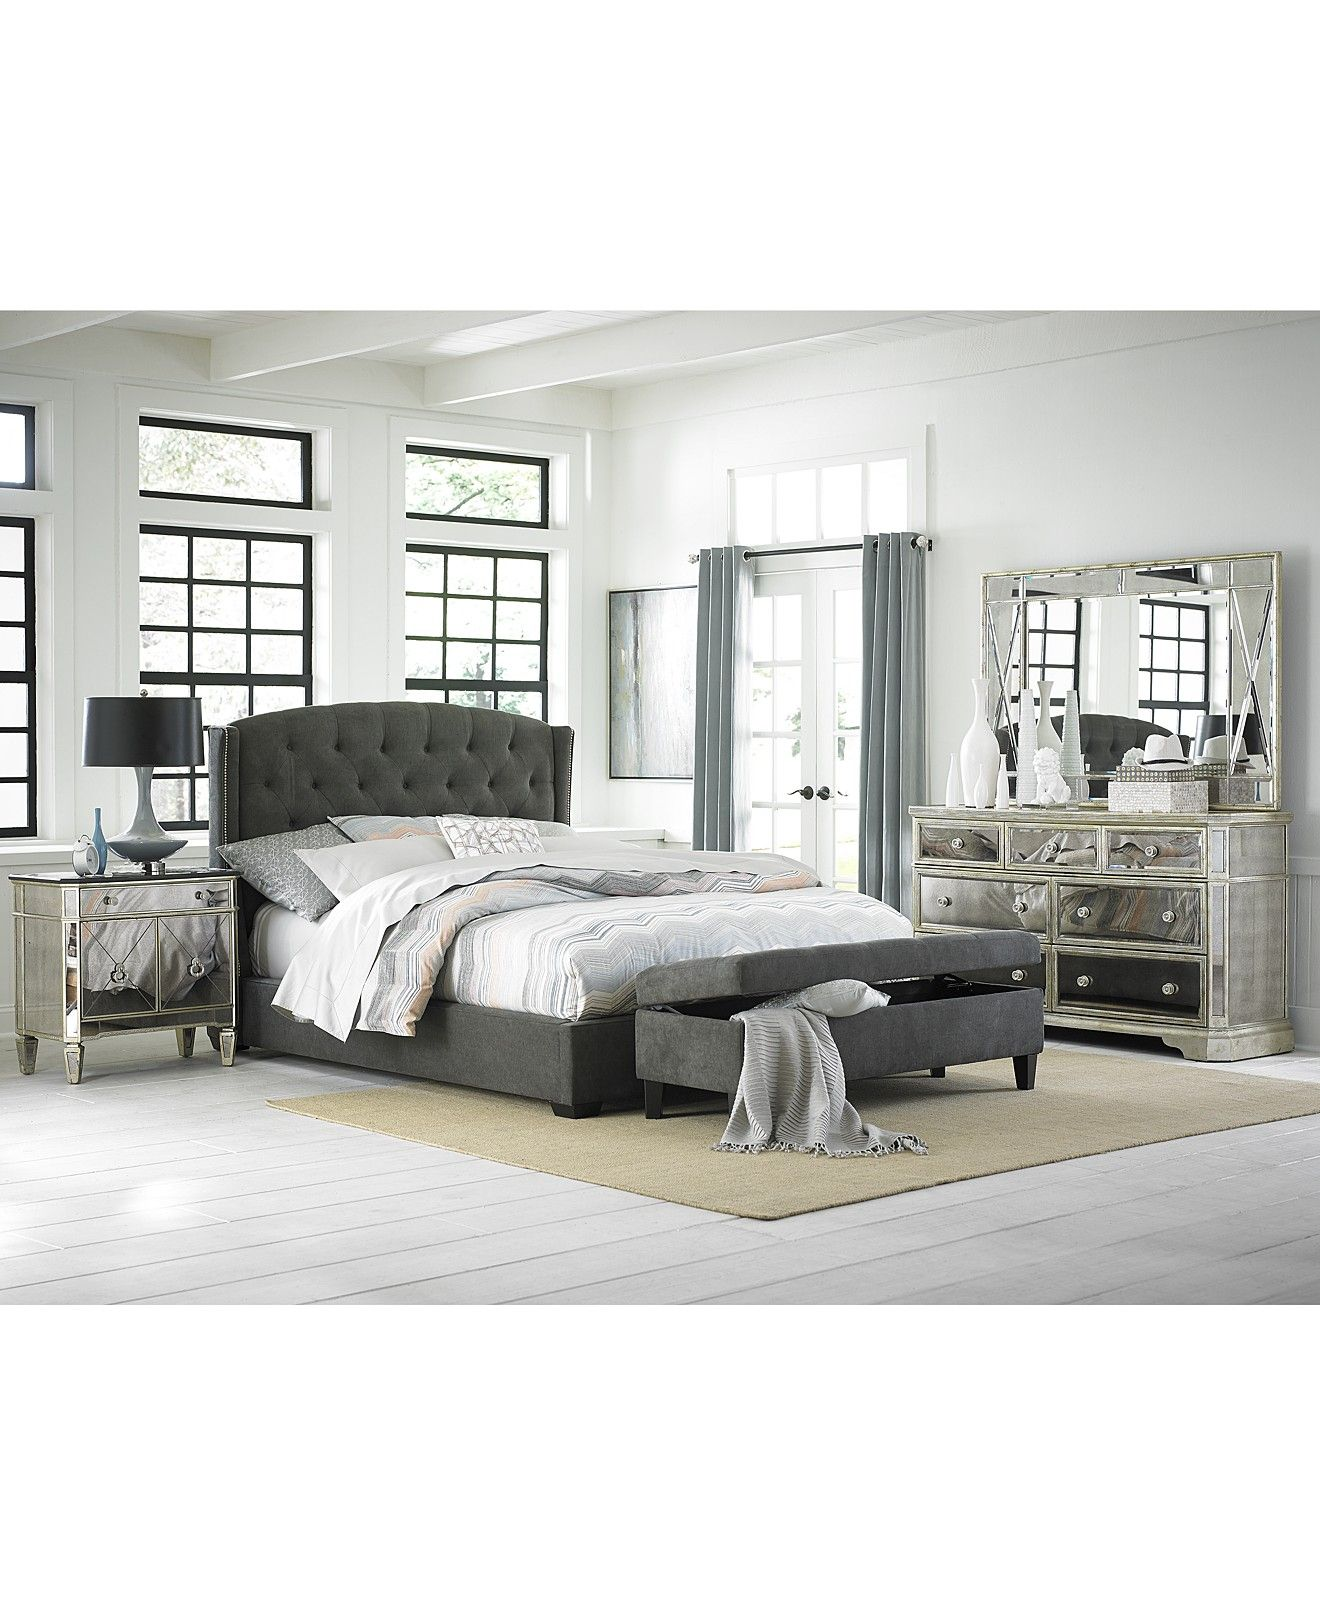 Macys Bedroom Furniture Lesley King Bed Shops California King Beds And Furniture